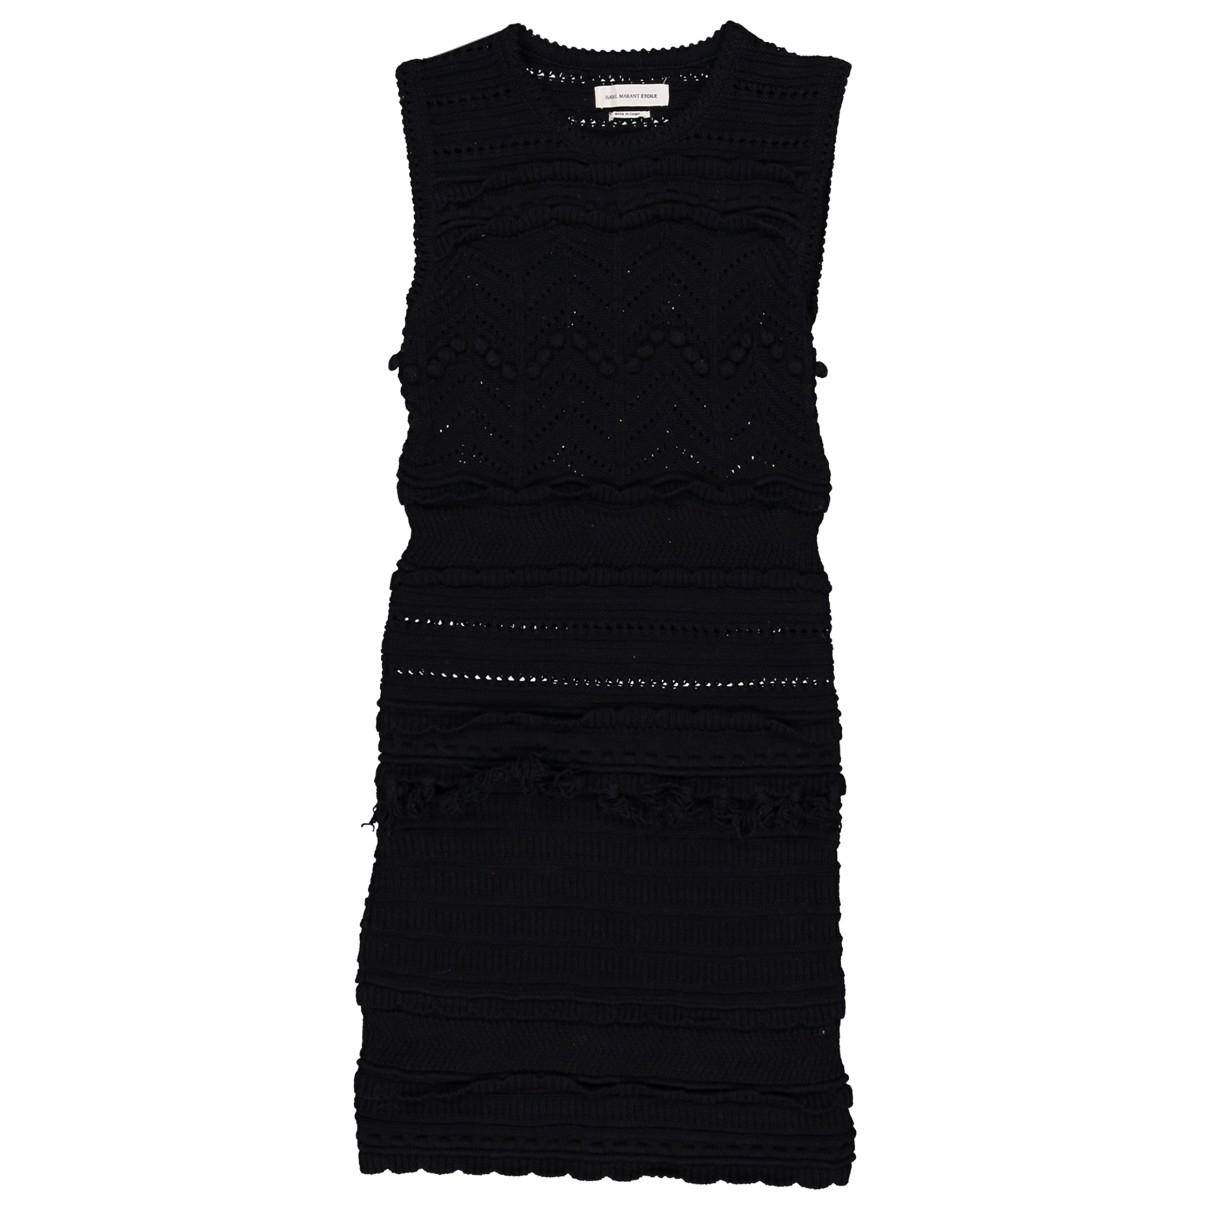 Isabel Marant \N Black Cotton dress for Women 34 FR